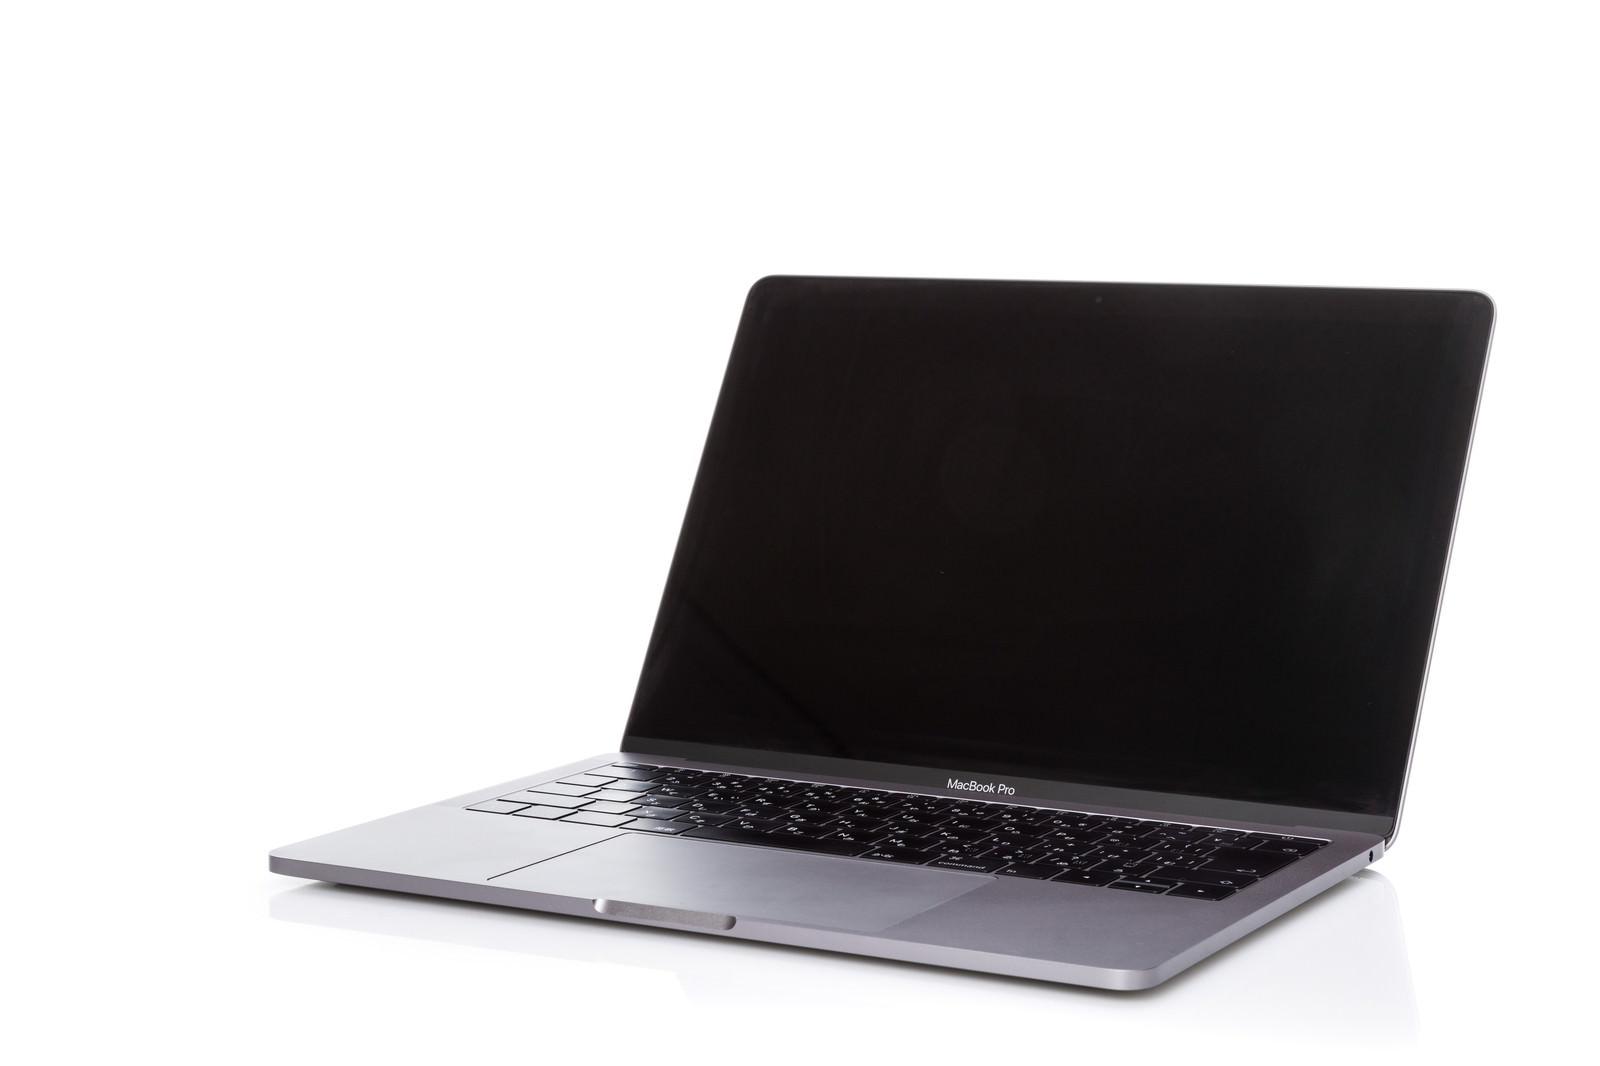 macbookproIMGL4508_TP_V-macbook-2ports.jpg